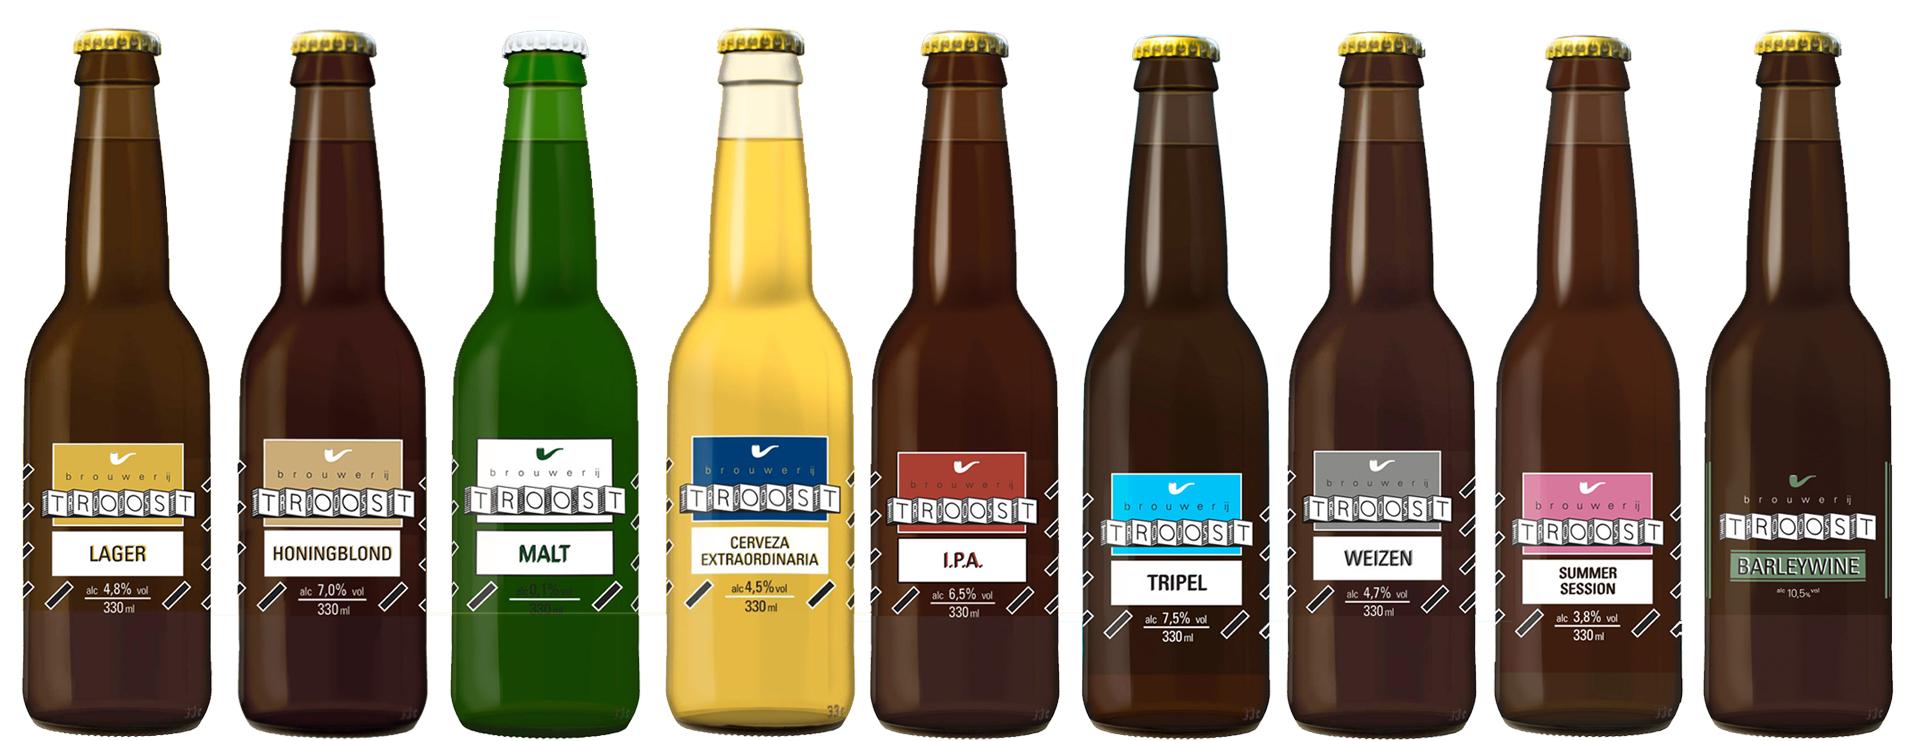 pils-bier-brouwerij-nederland-streekbier-amsterdam-troost-foto-02